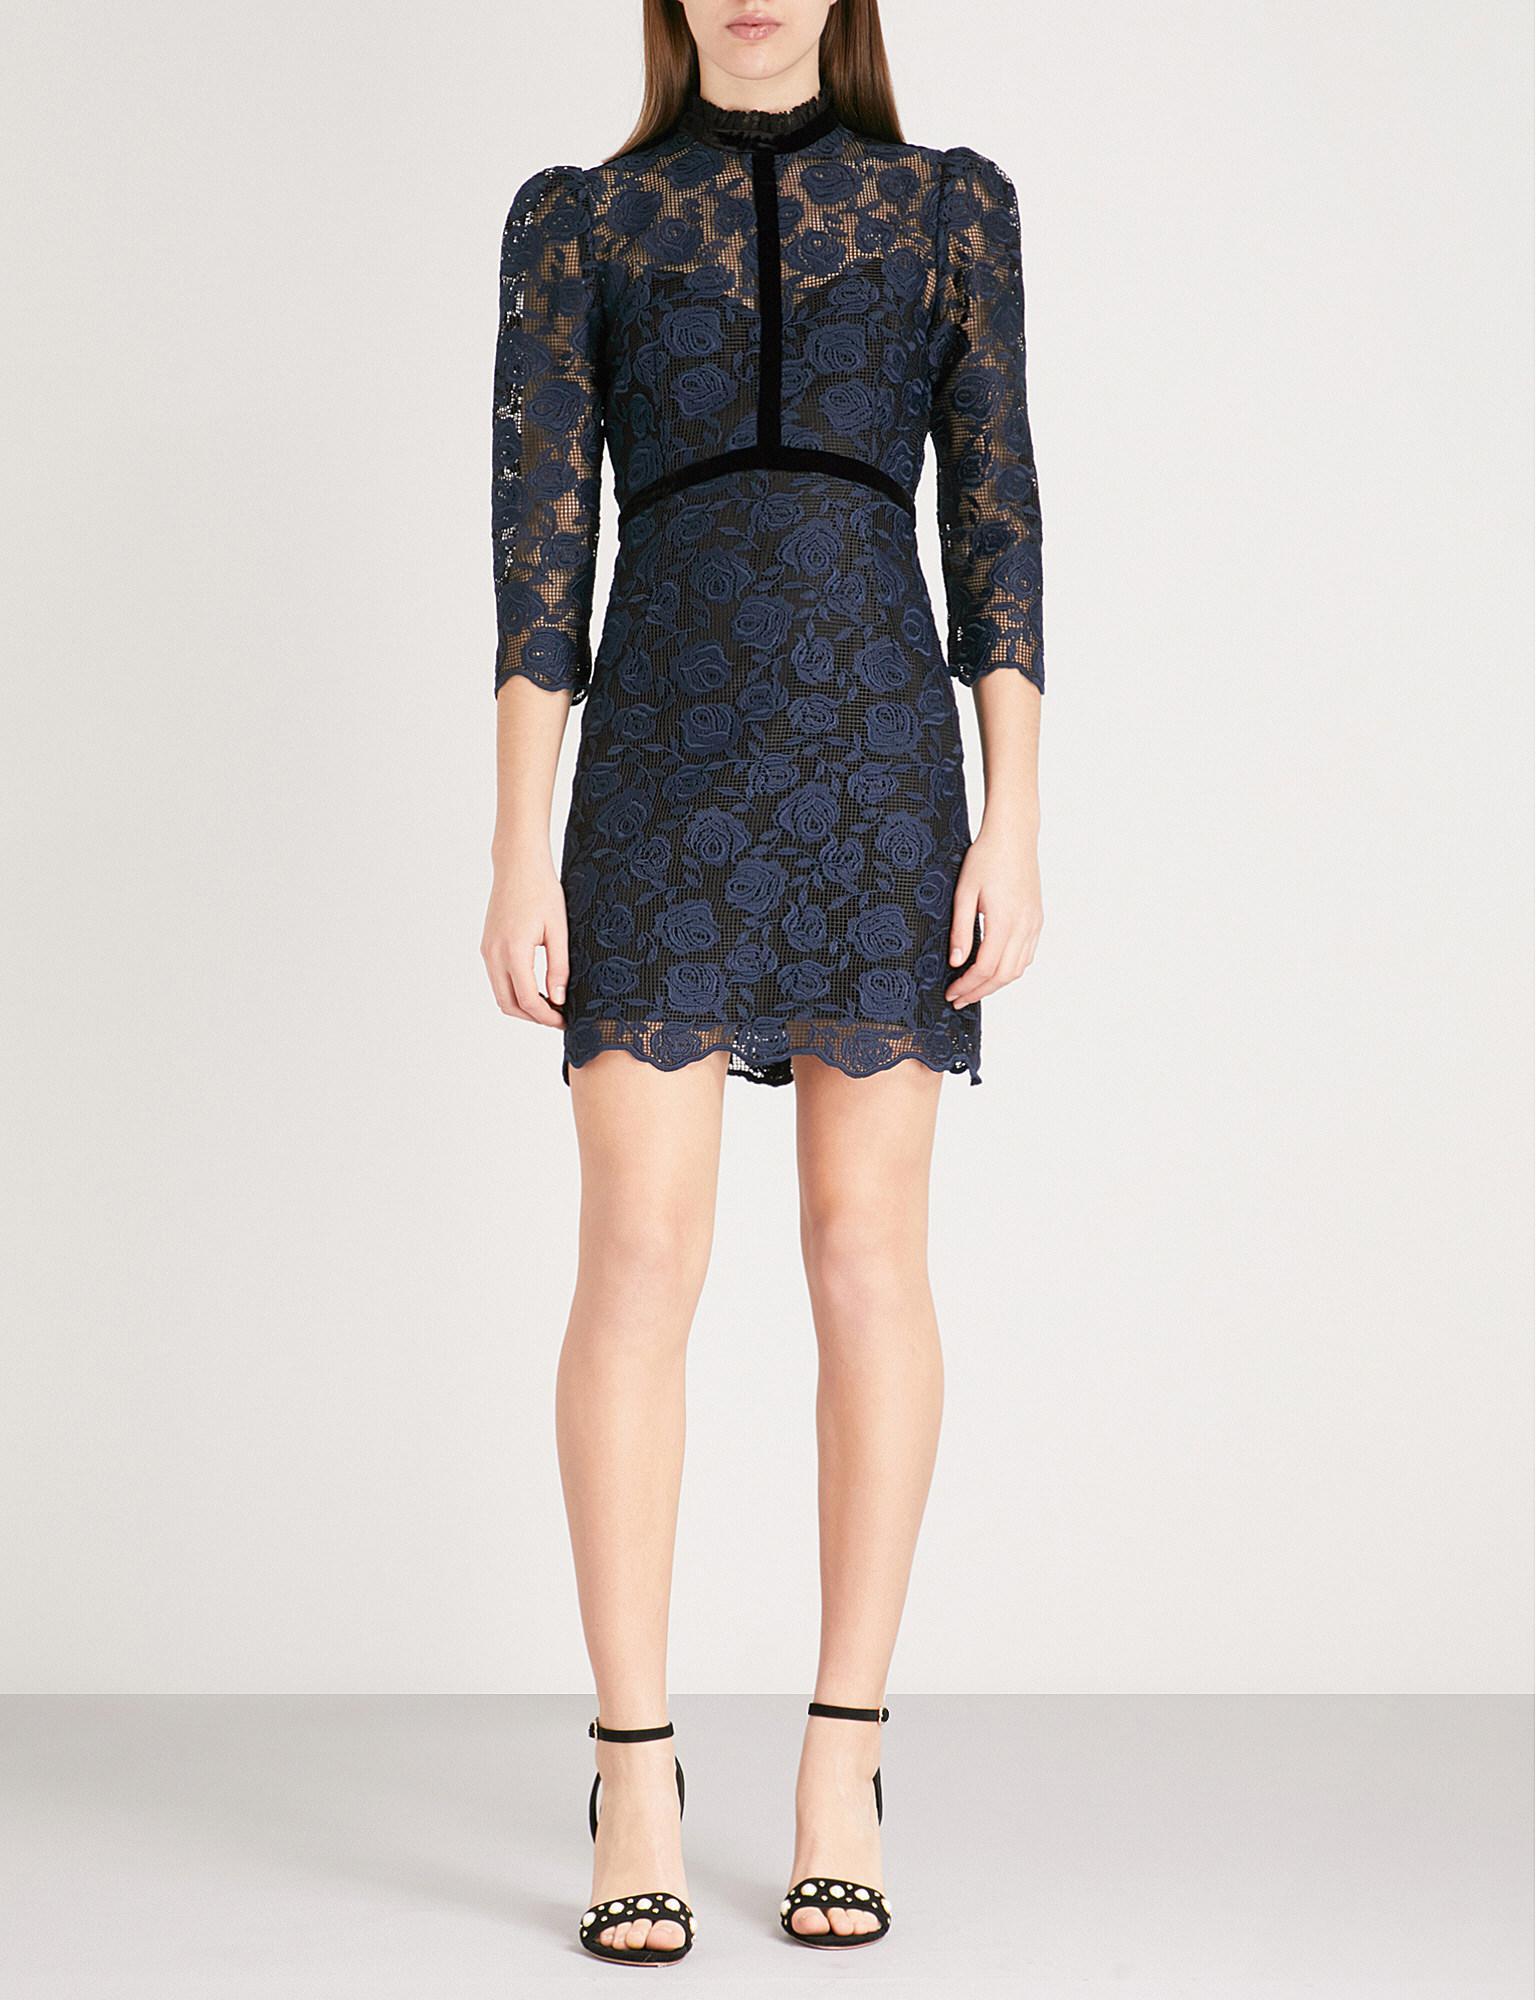 Velvet Trim Lace And Mesh Dress